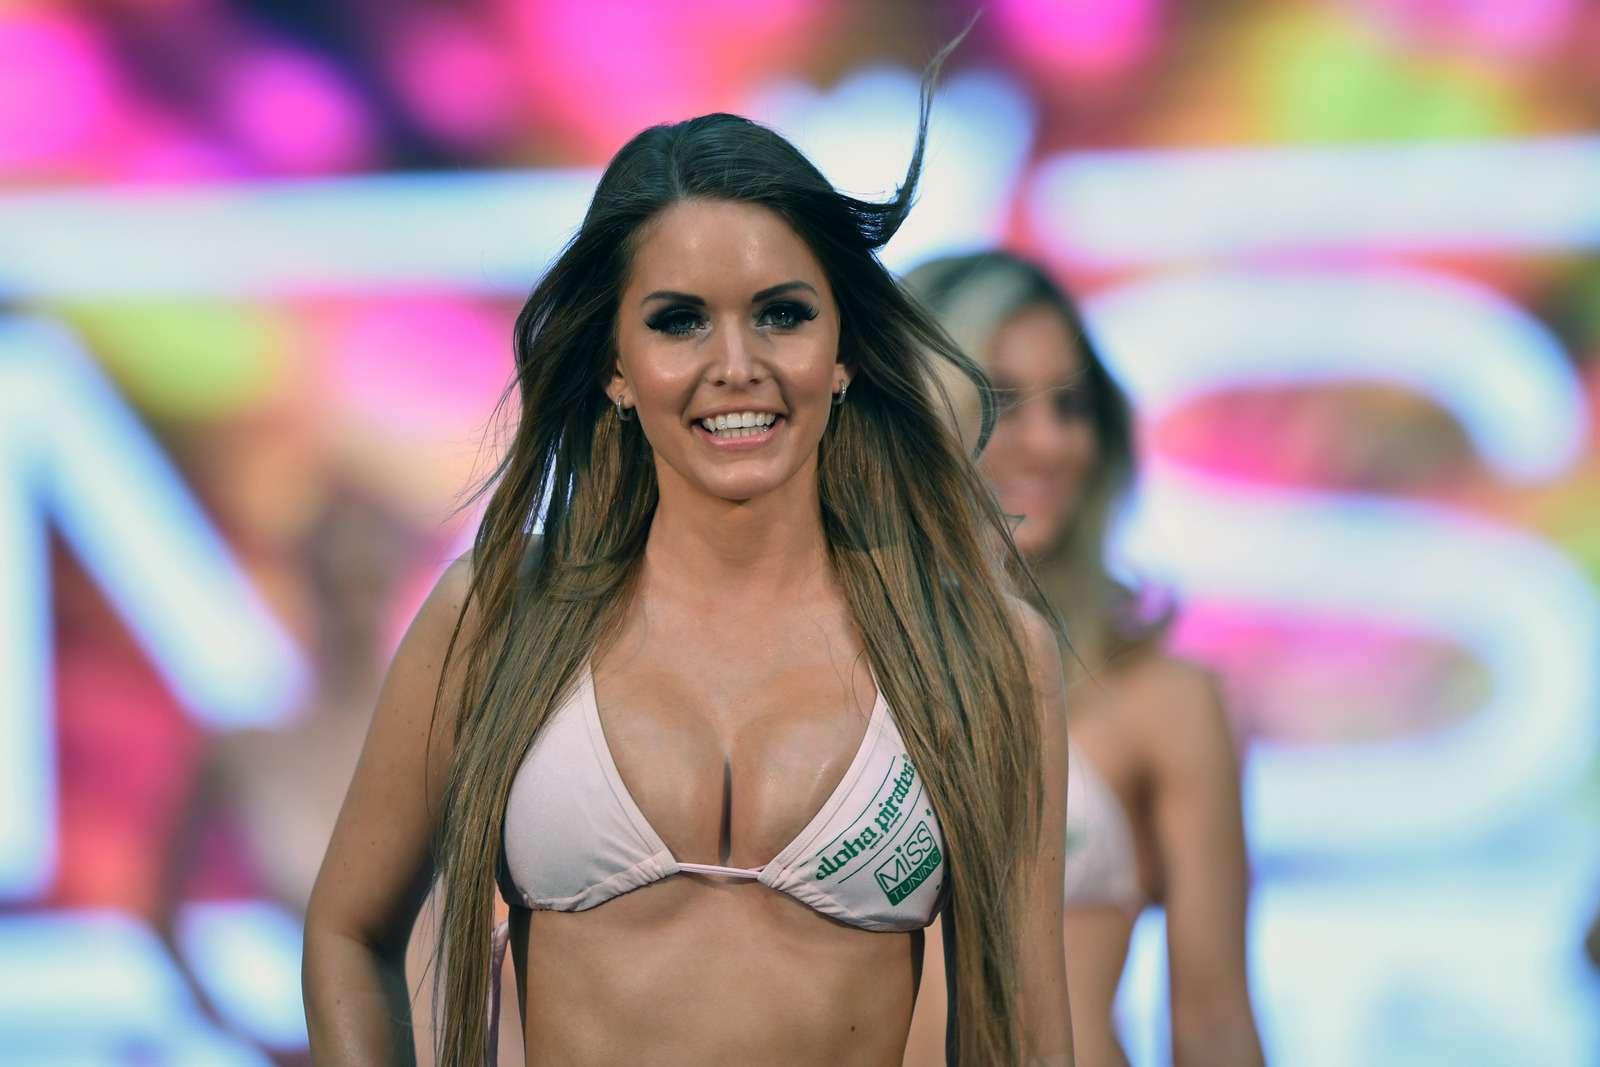 Miss Tuning 2017: фотогалерея финалисток ипобедительницы— фото 746709